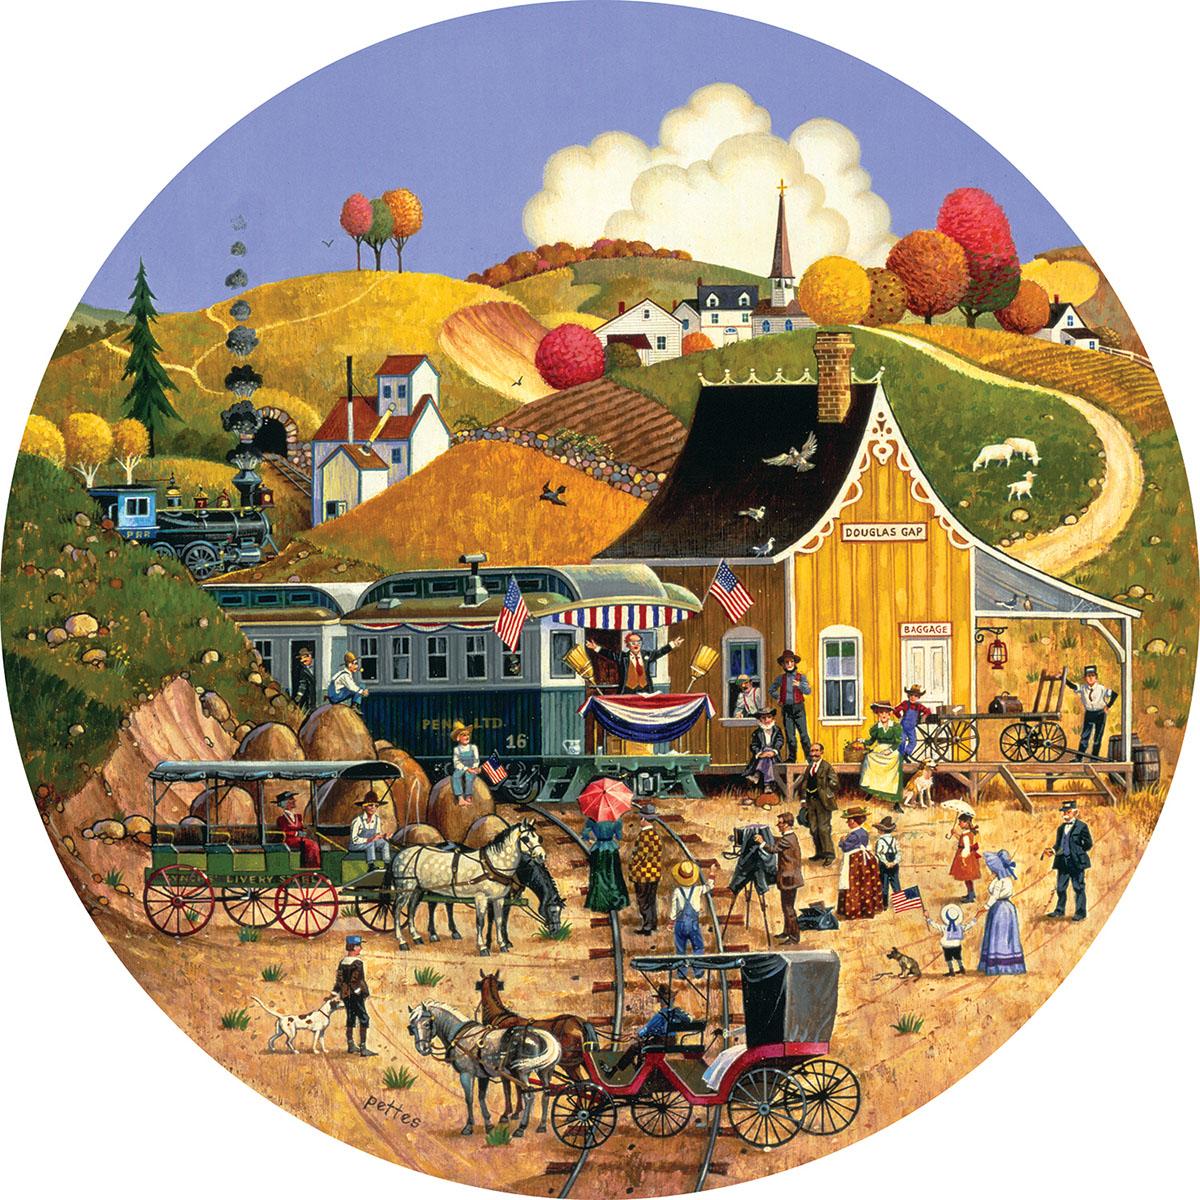 Douglas Gap Americana & Folk Art Shaped Puzzle